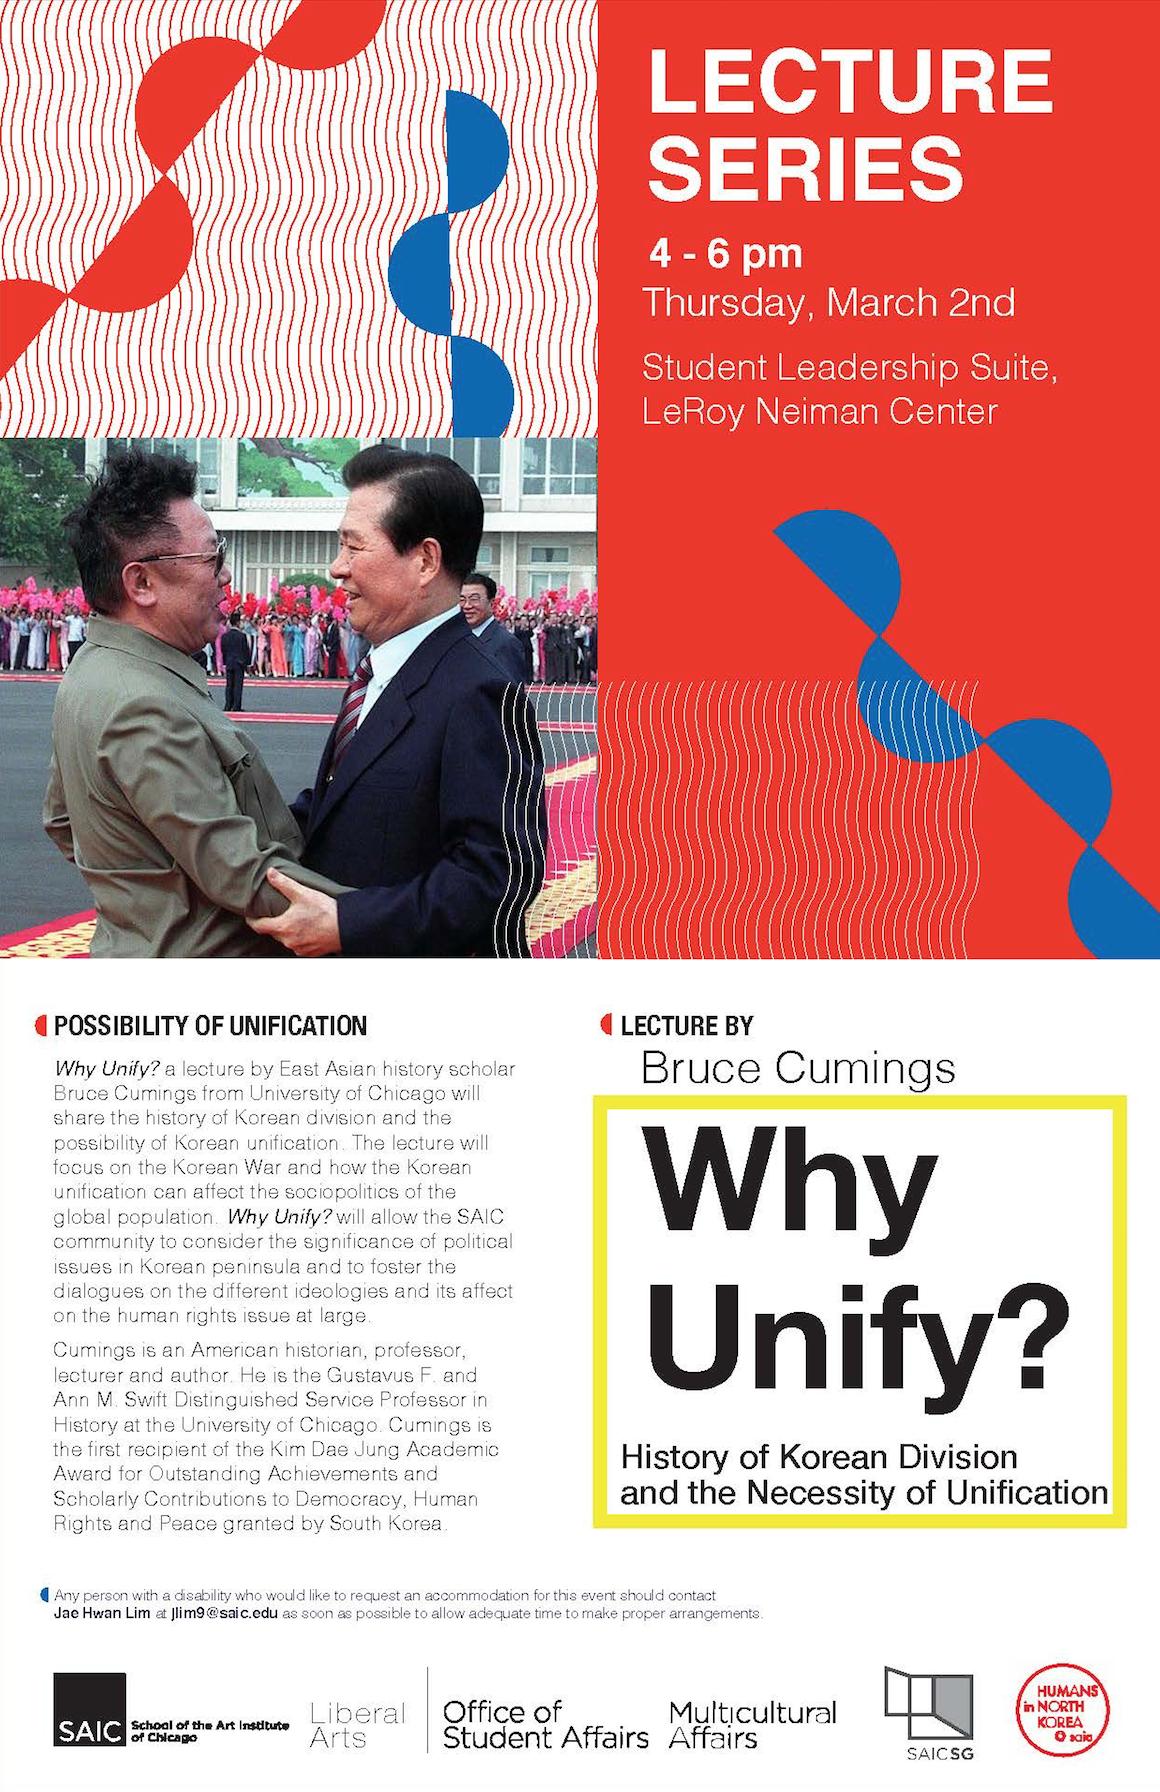 Poster Design by Rachel Yelinn Chung.